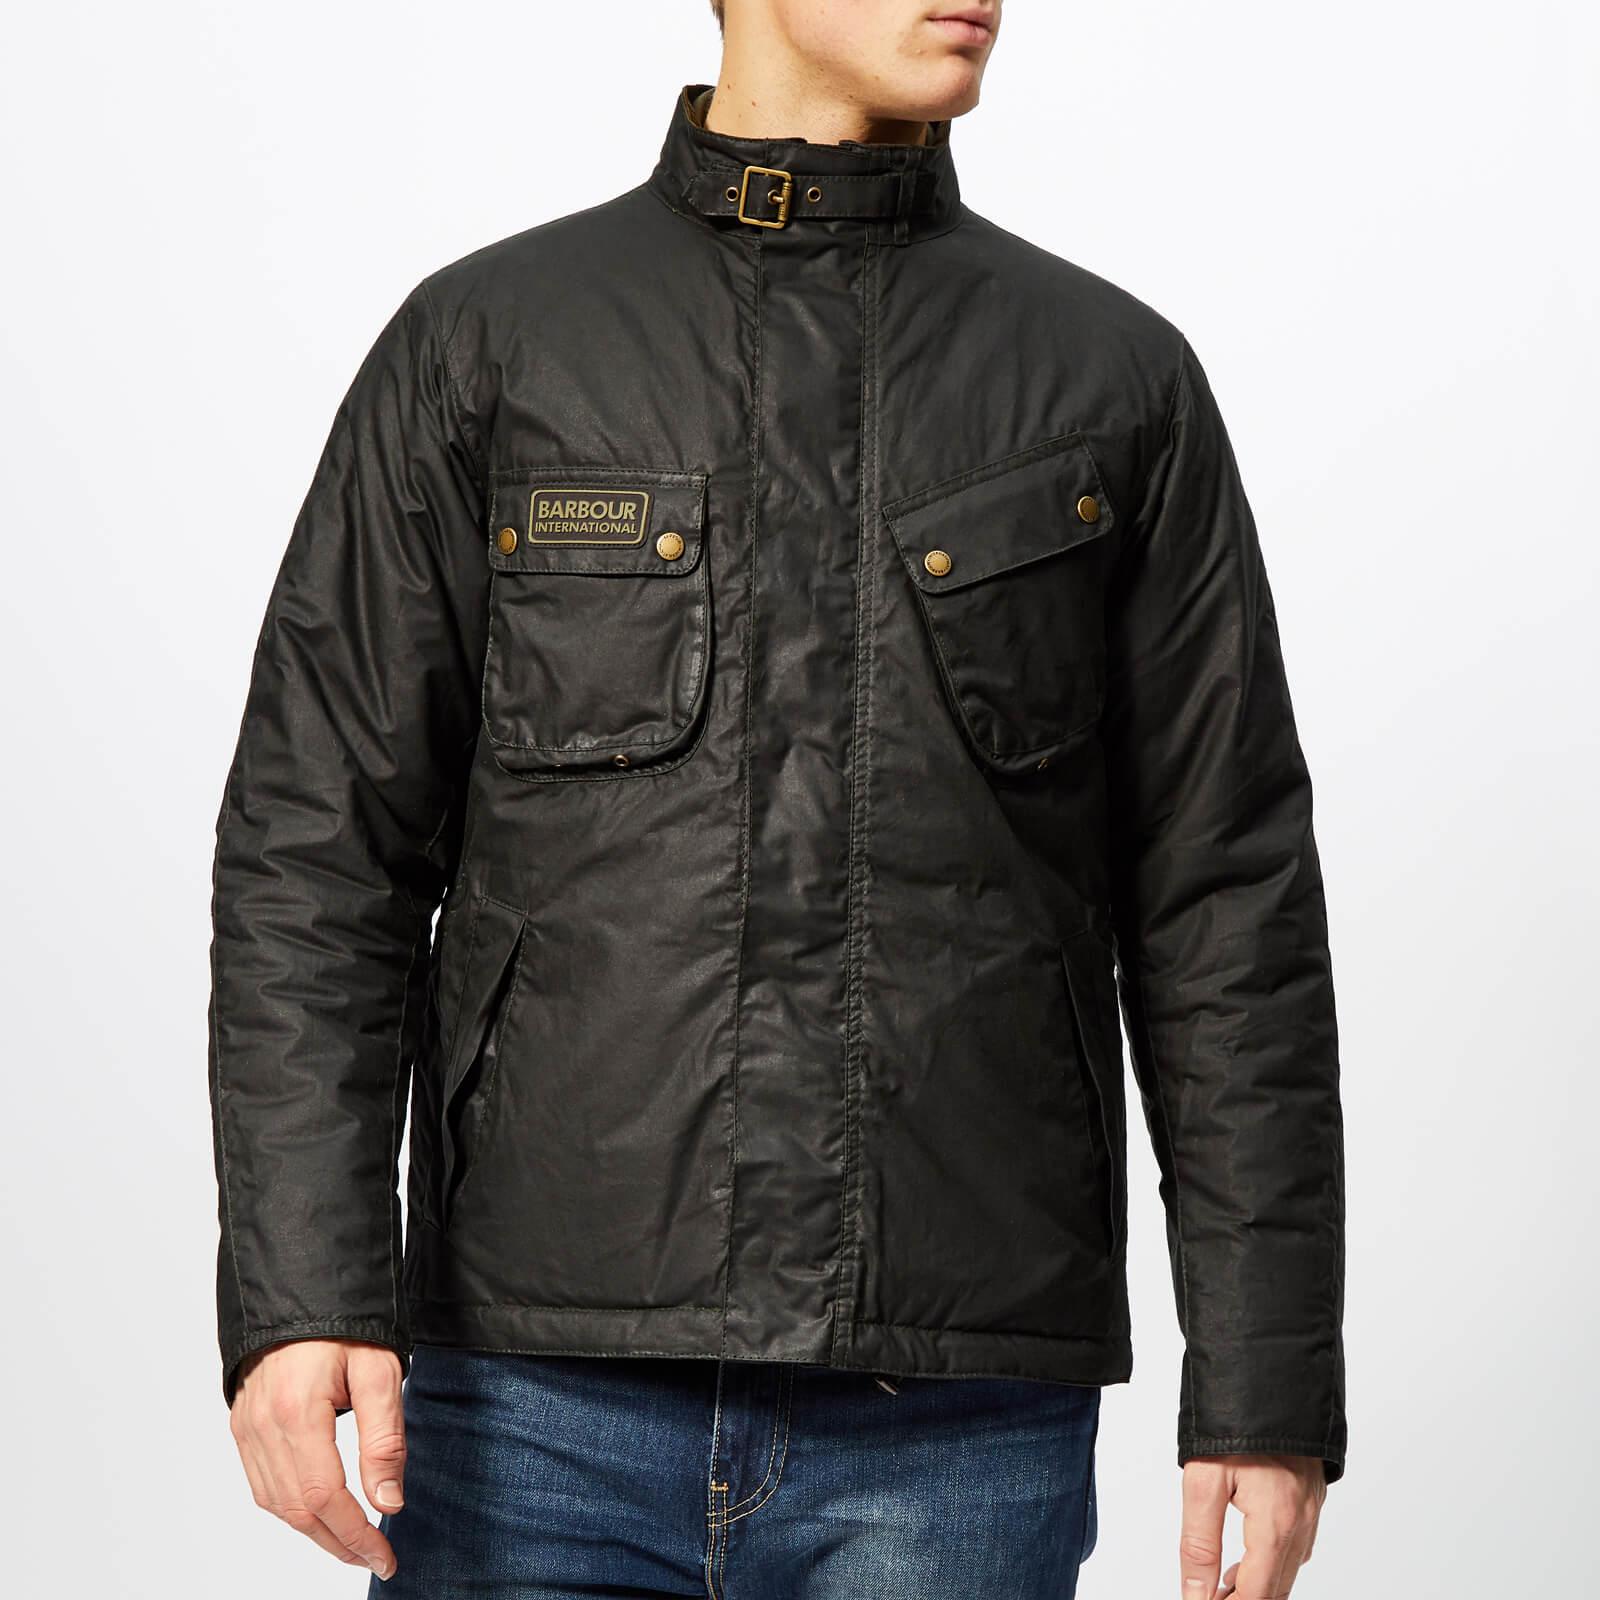 3bef690150 Barbour International Men's Lever Wax Jacket - Sage - Free UK Delivery over  £50